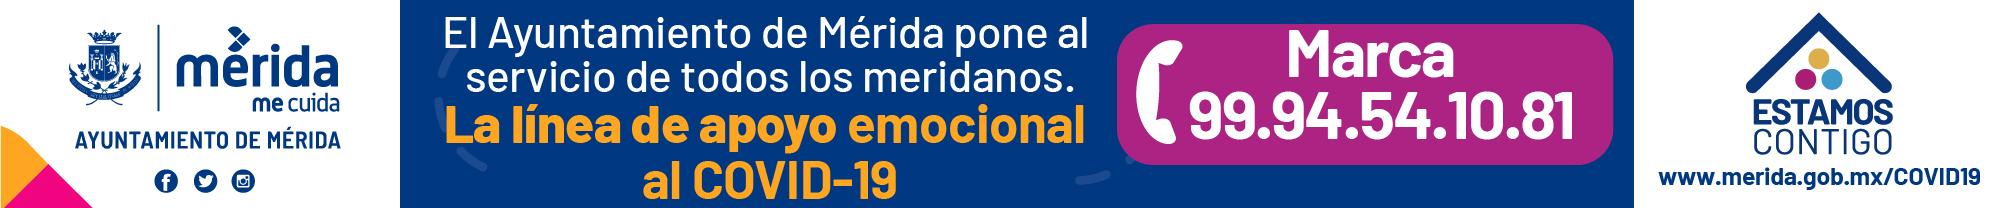 Banner Linea Emocional_Revista Rural 960 x 100 px